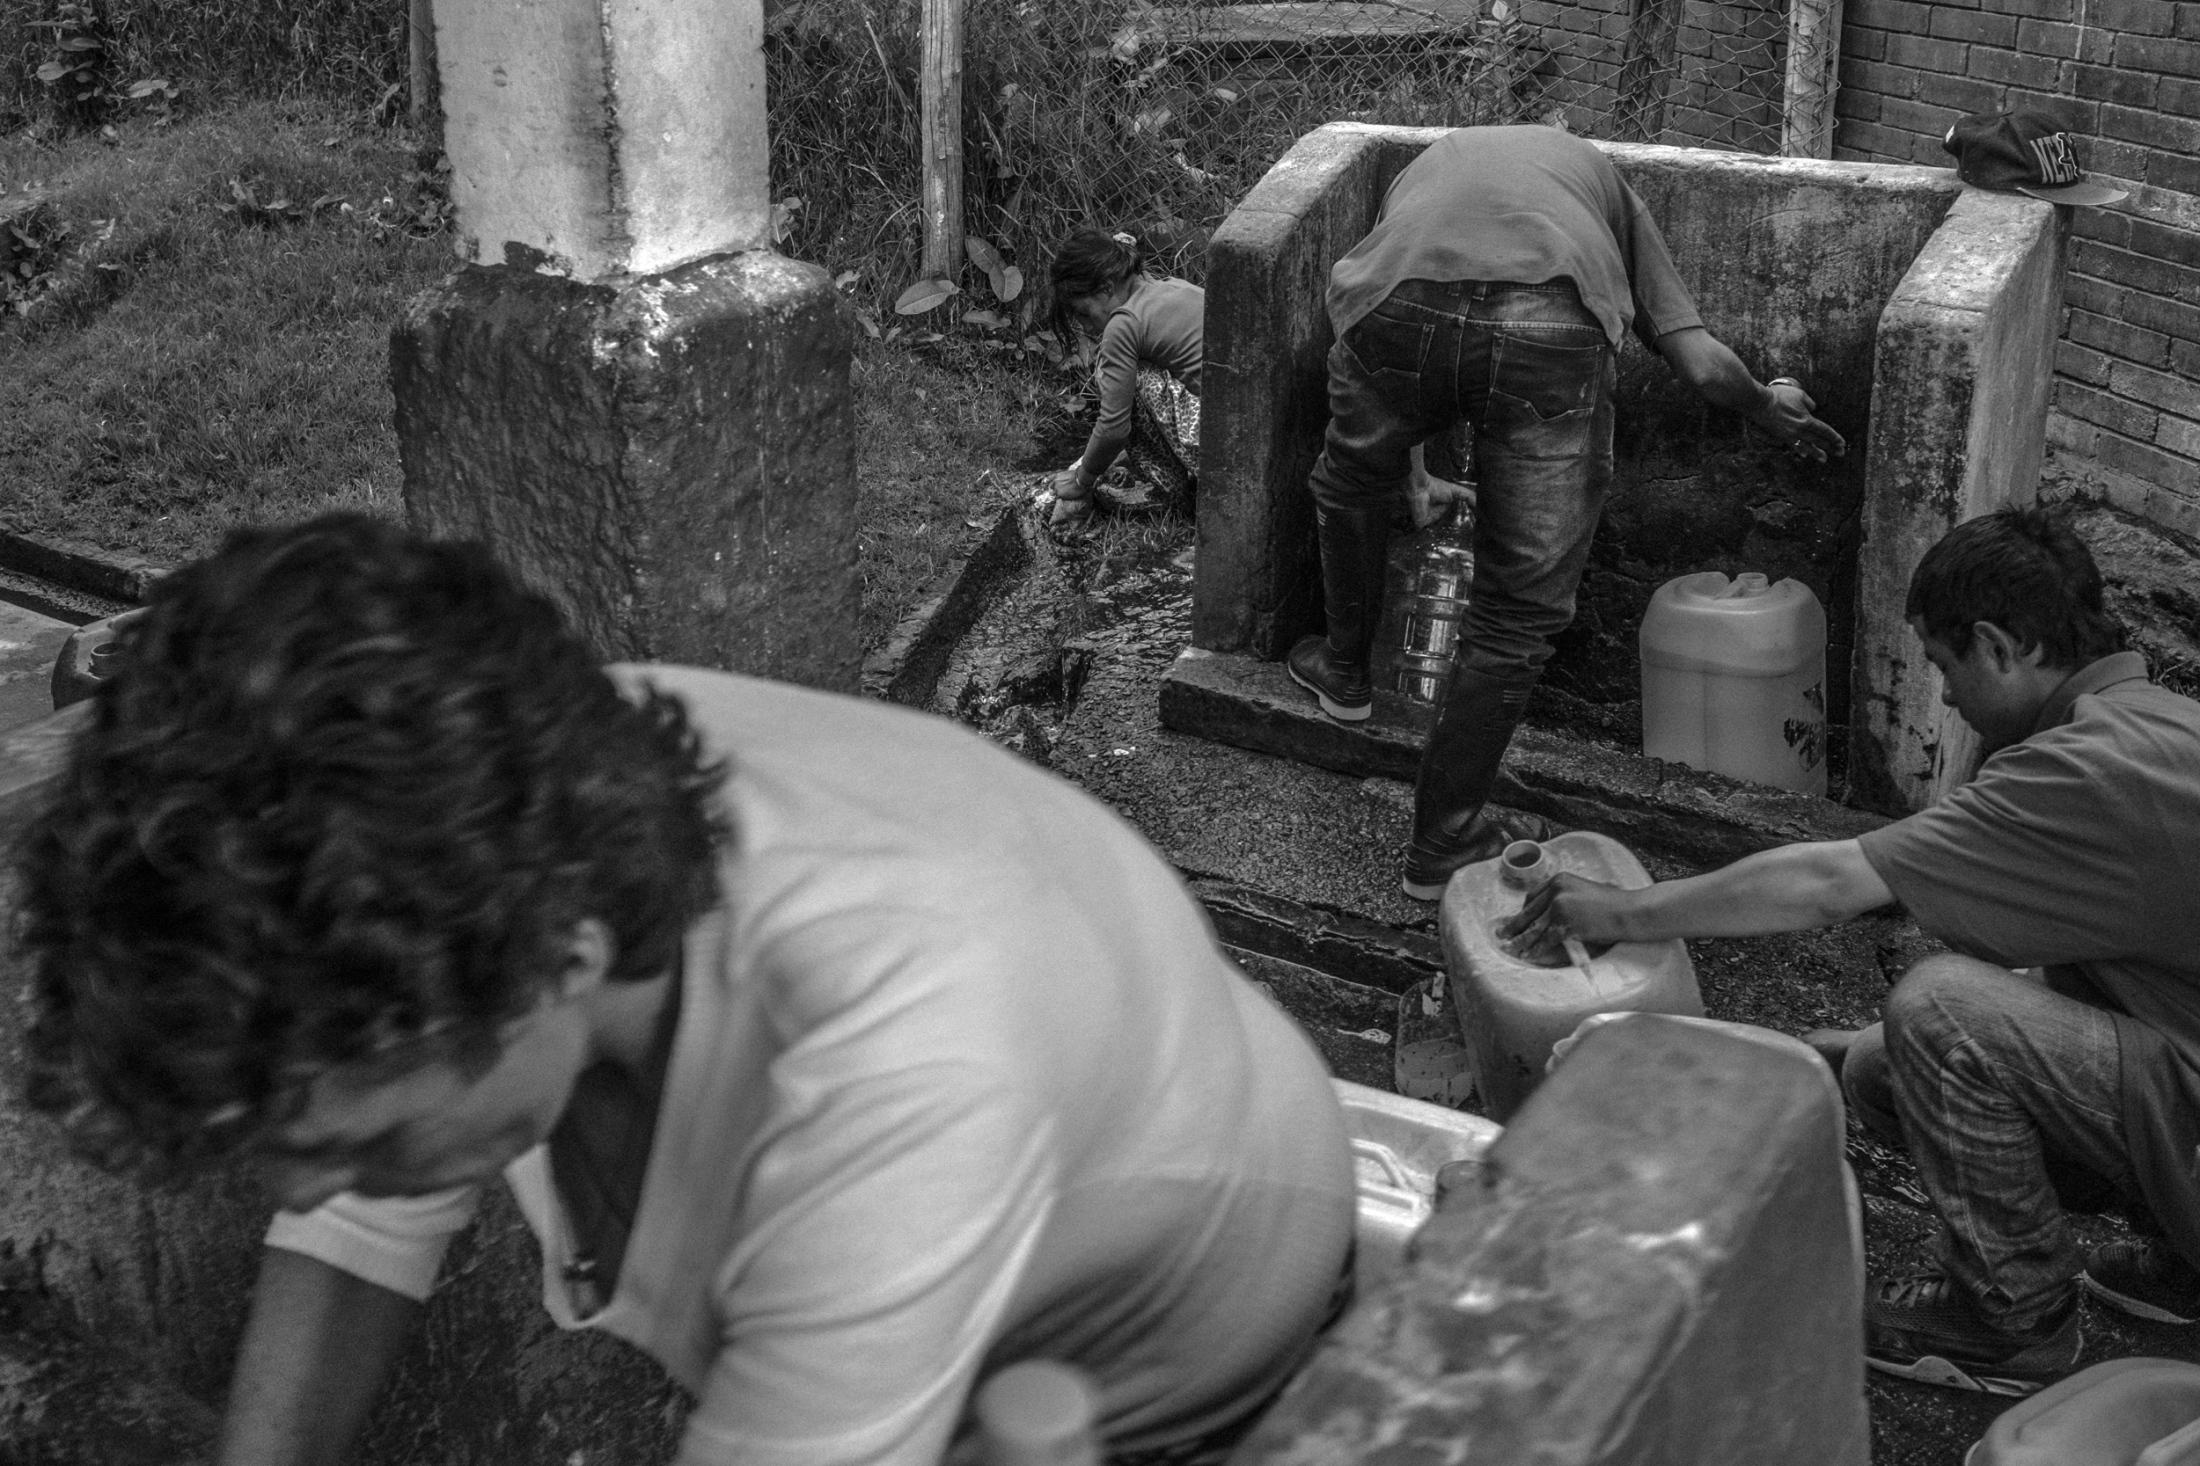 Art and Documentary Photography - Loading ZuletaR__os_CarangasYElJaguar_014.JPG